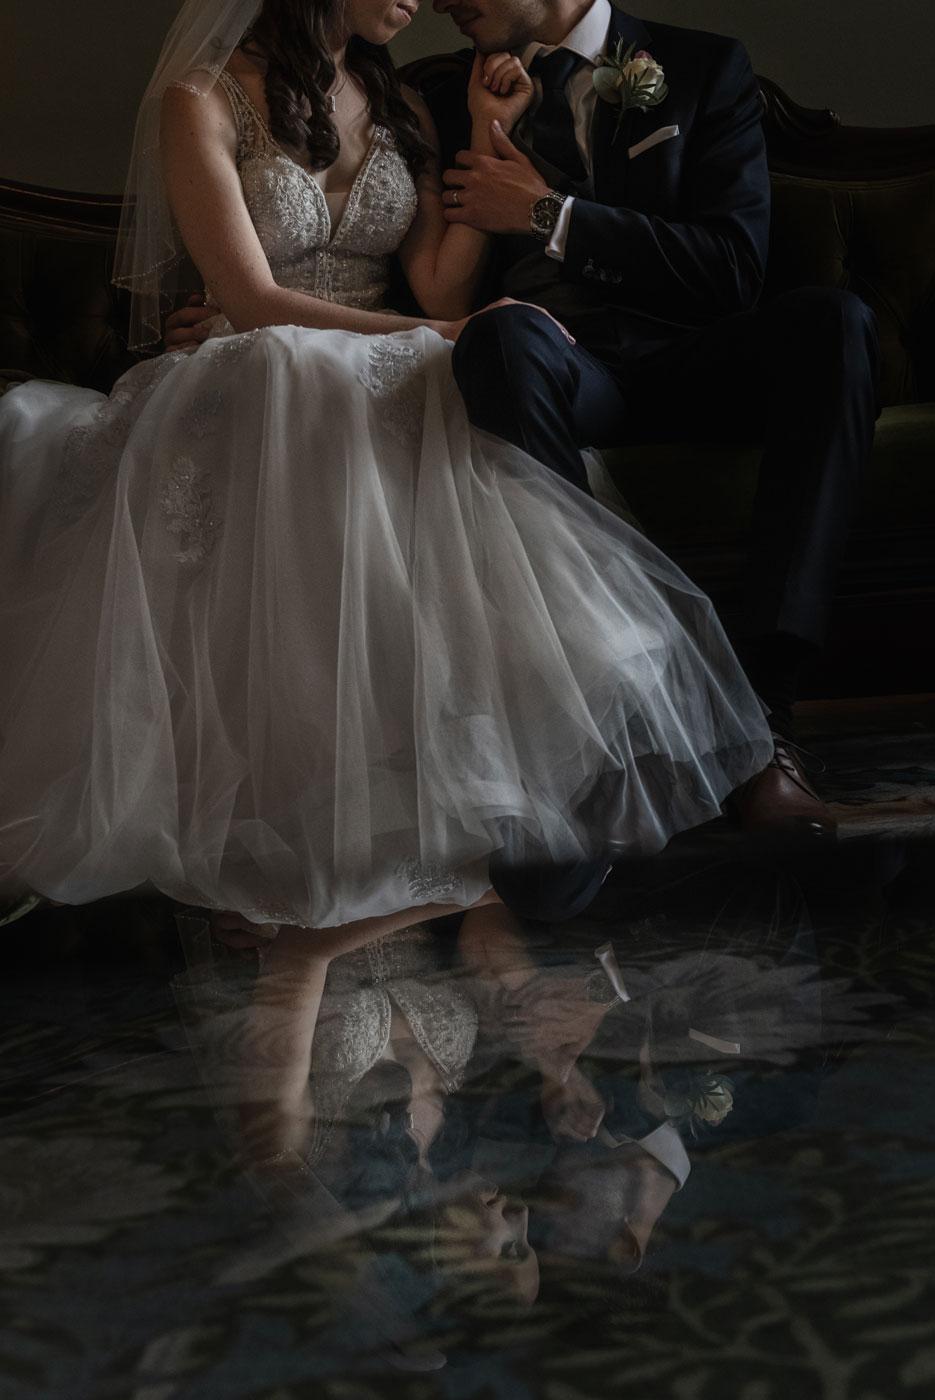 Reflection of bride and groom at Eynsham Hall